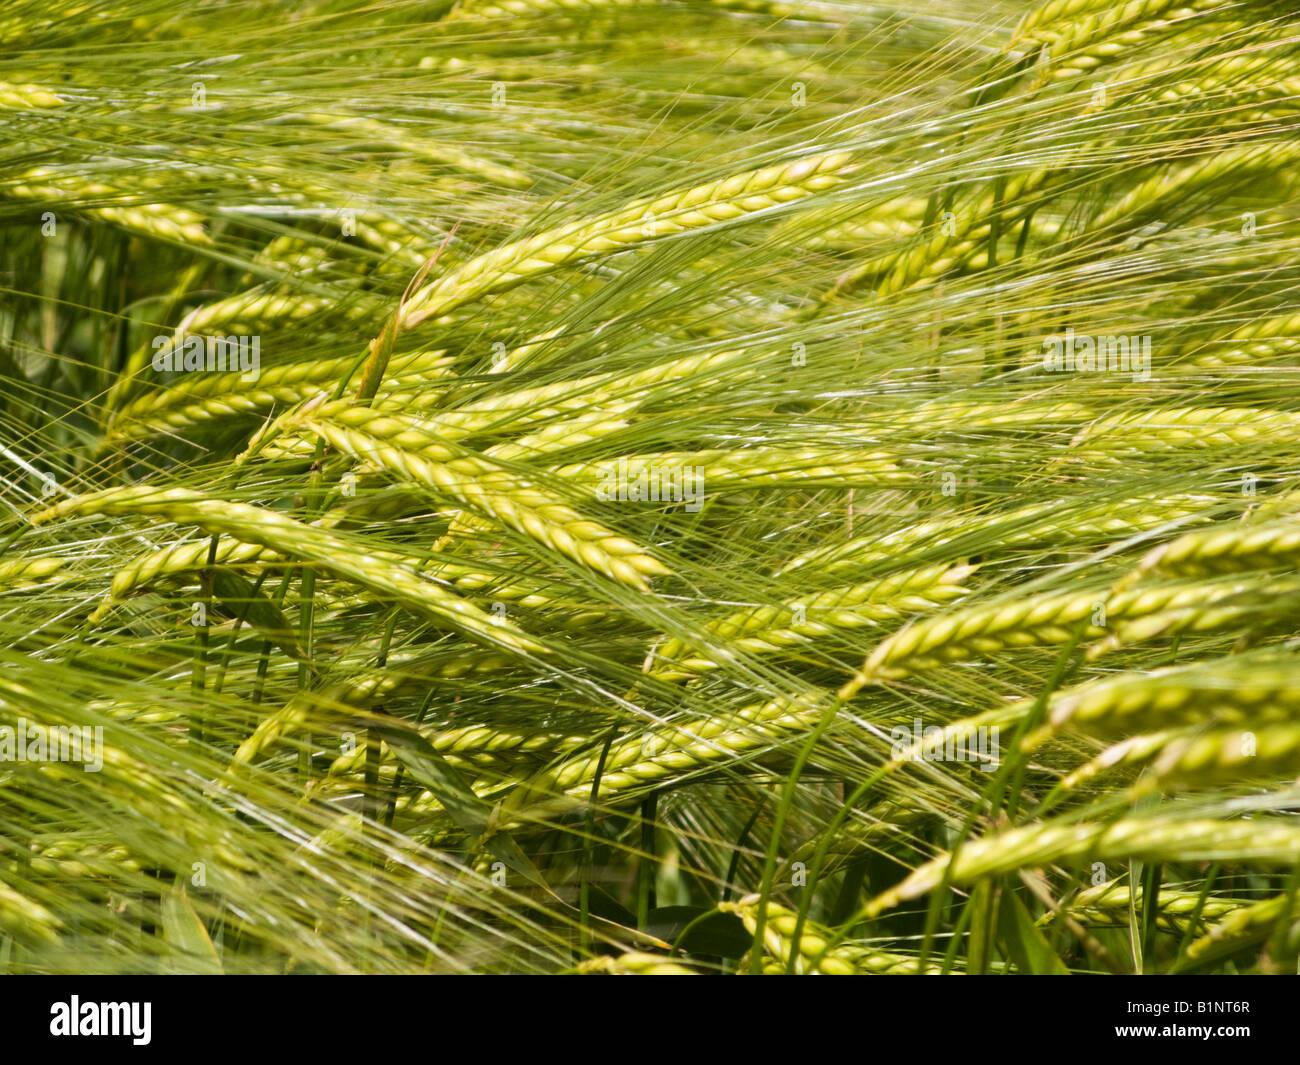 Barley crop close up UK - Stock Image